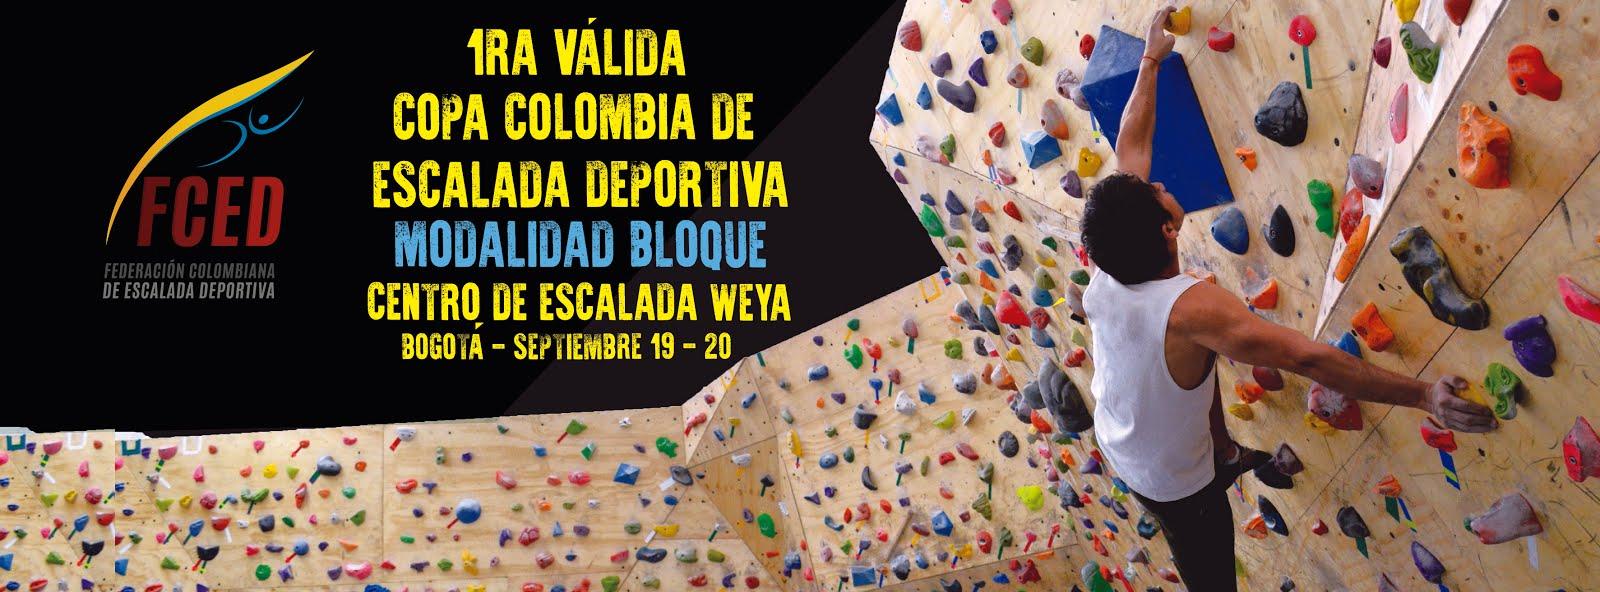 Válida Bloque - Bogotá (Weya) - Septiembre